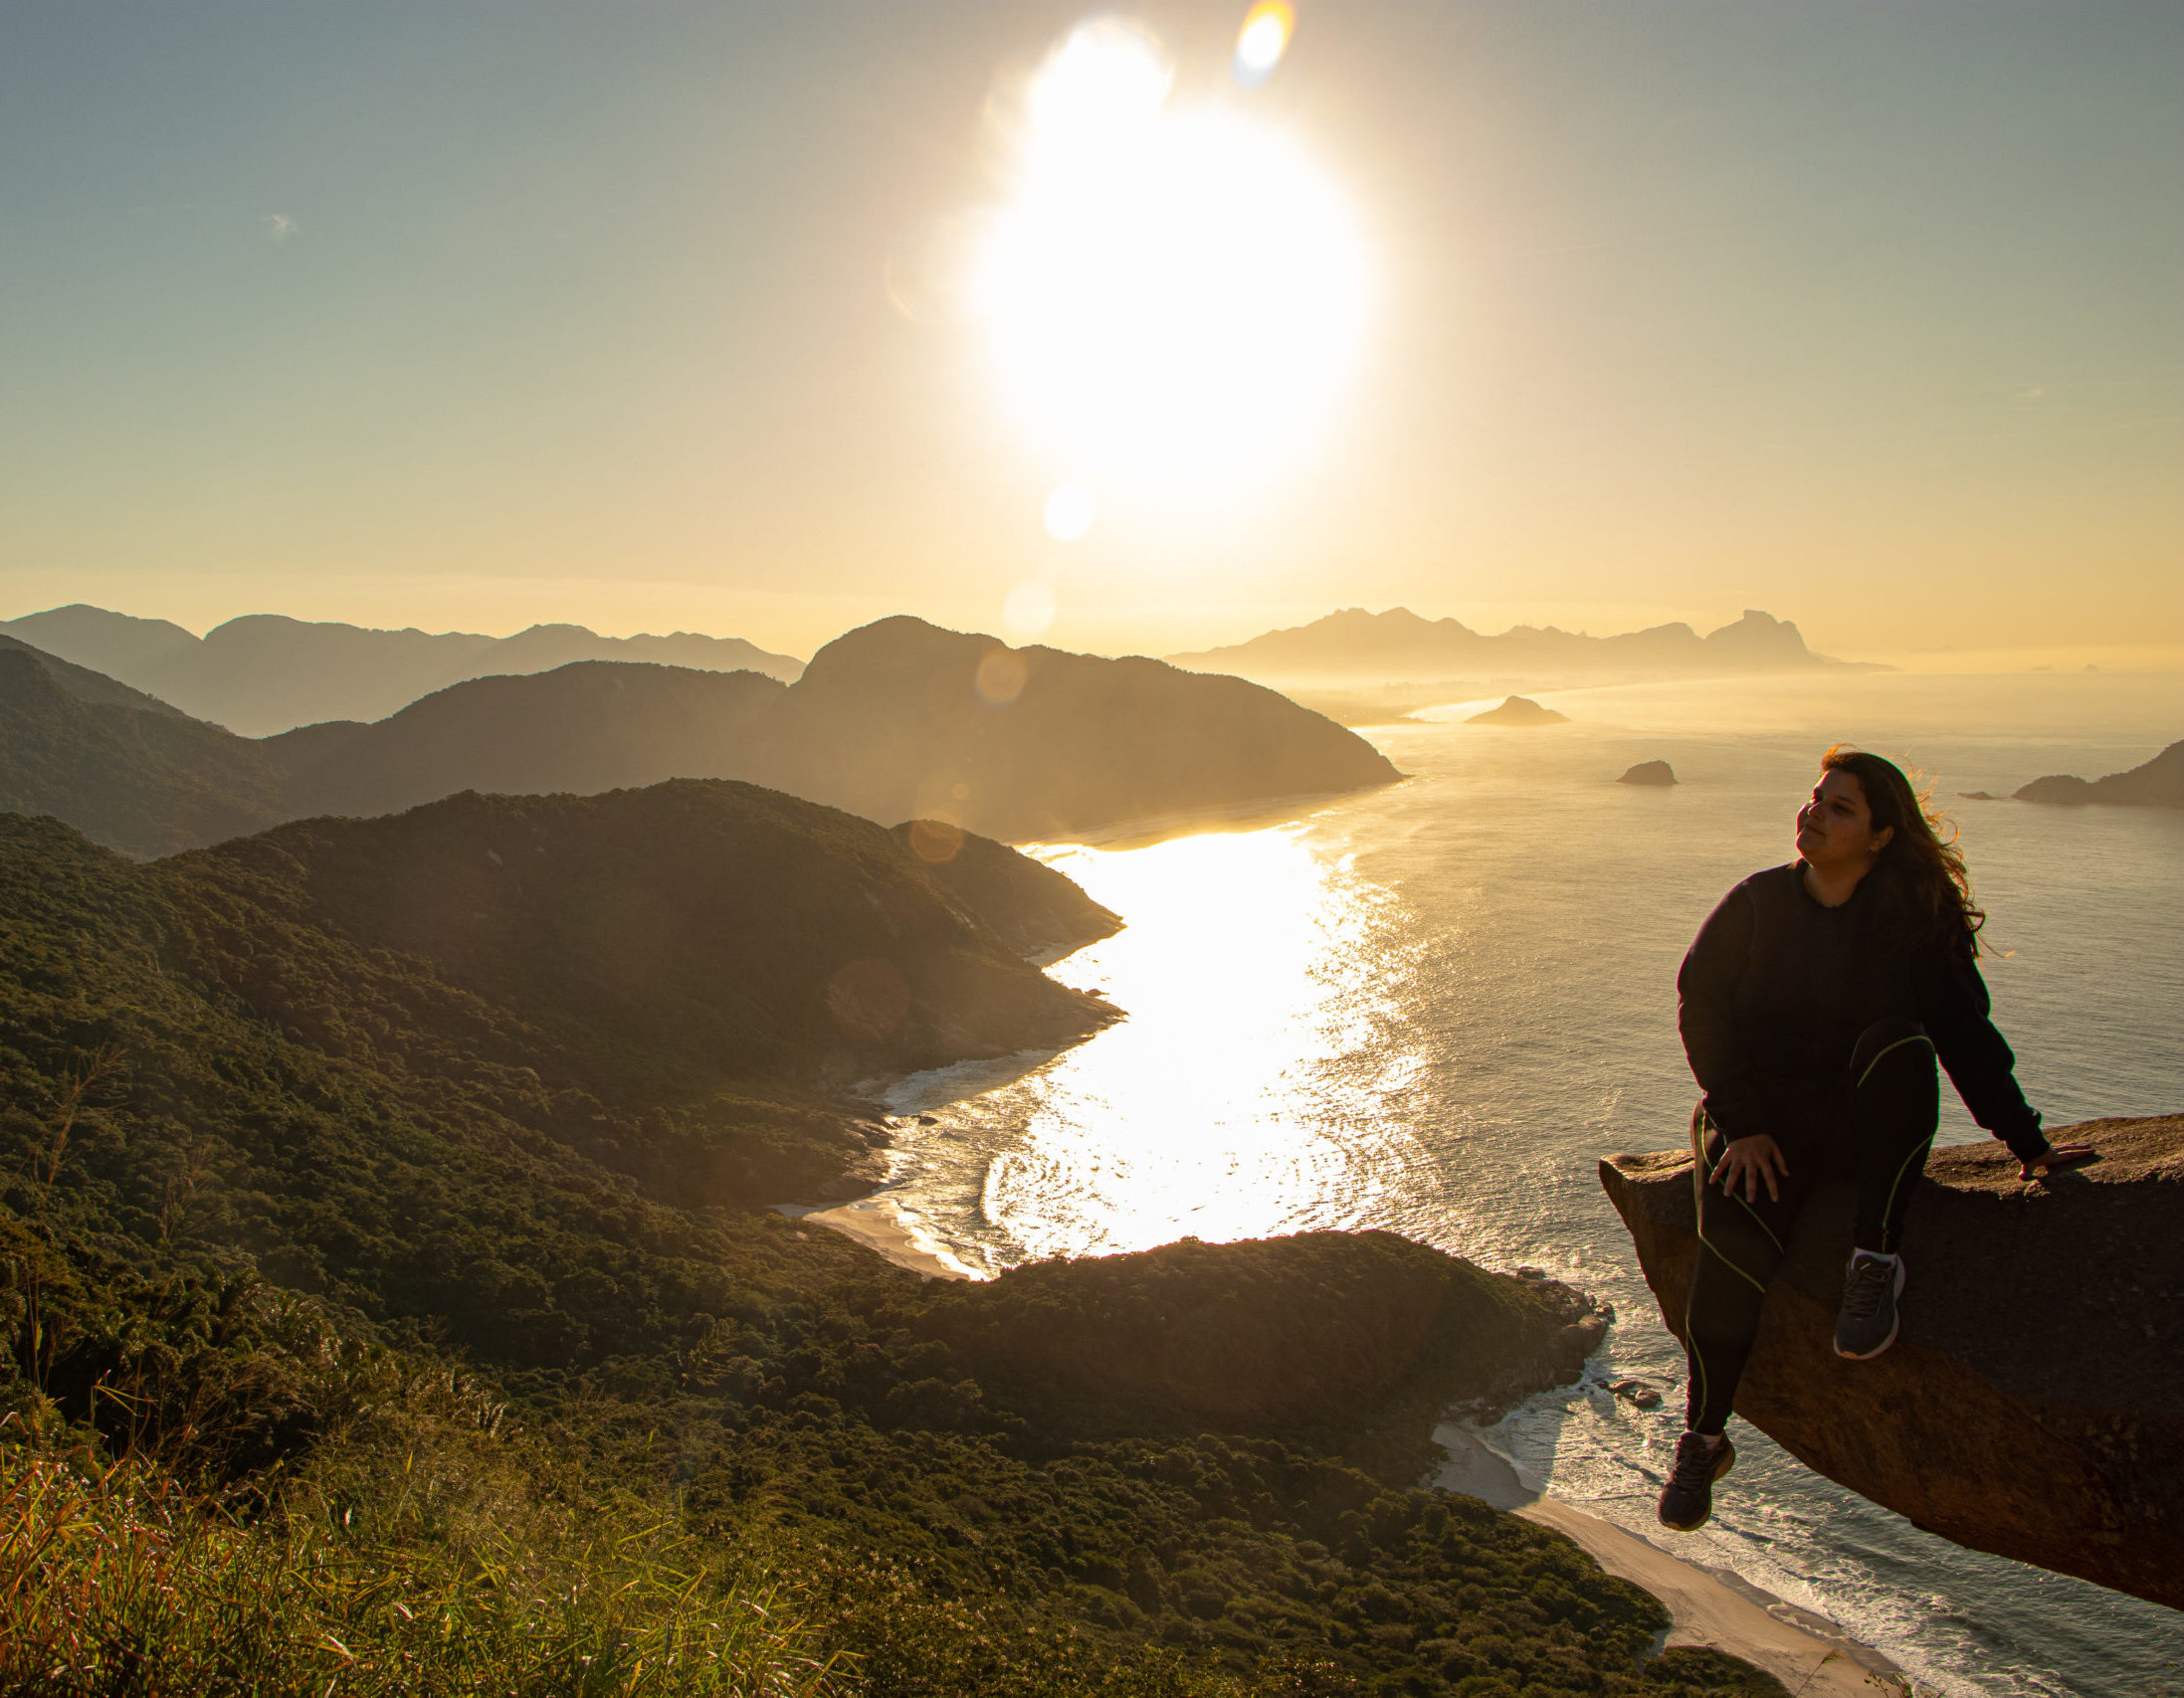 Destinos Brasileiros para viajar durante a pandemia